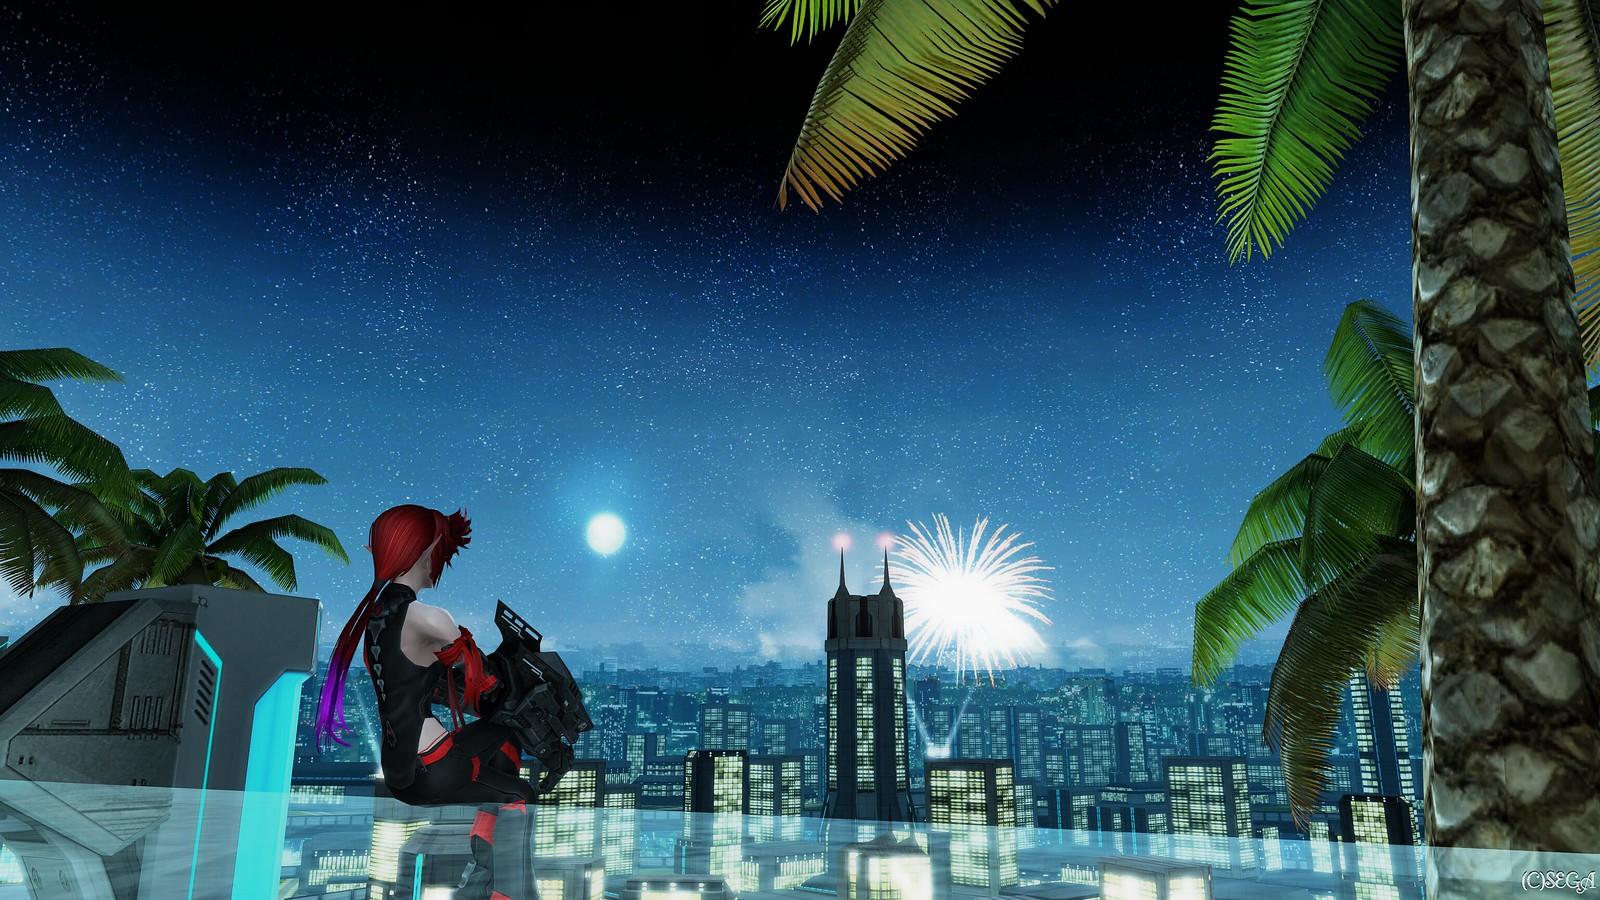 Phantasy Star Online 2 Screenshot 2020.12.06 - 01.49.40.44